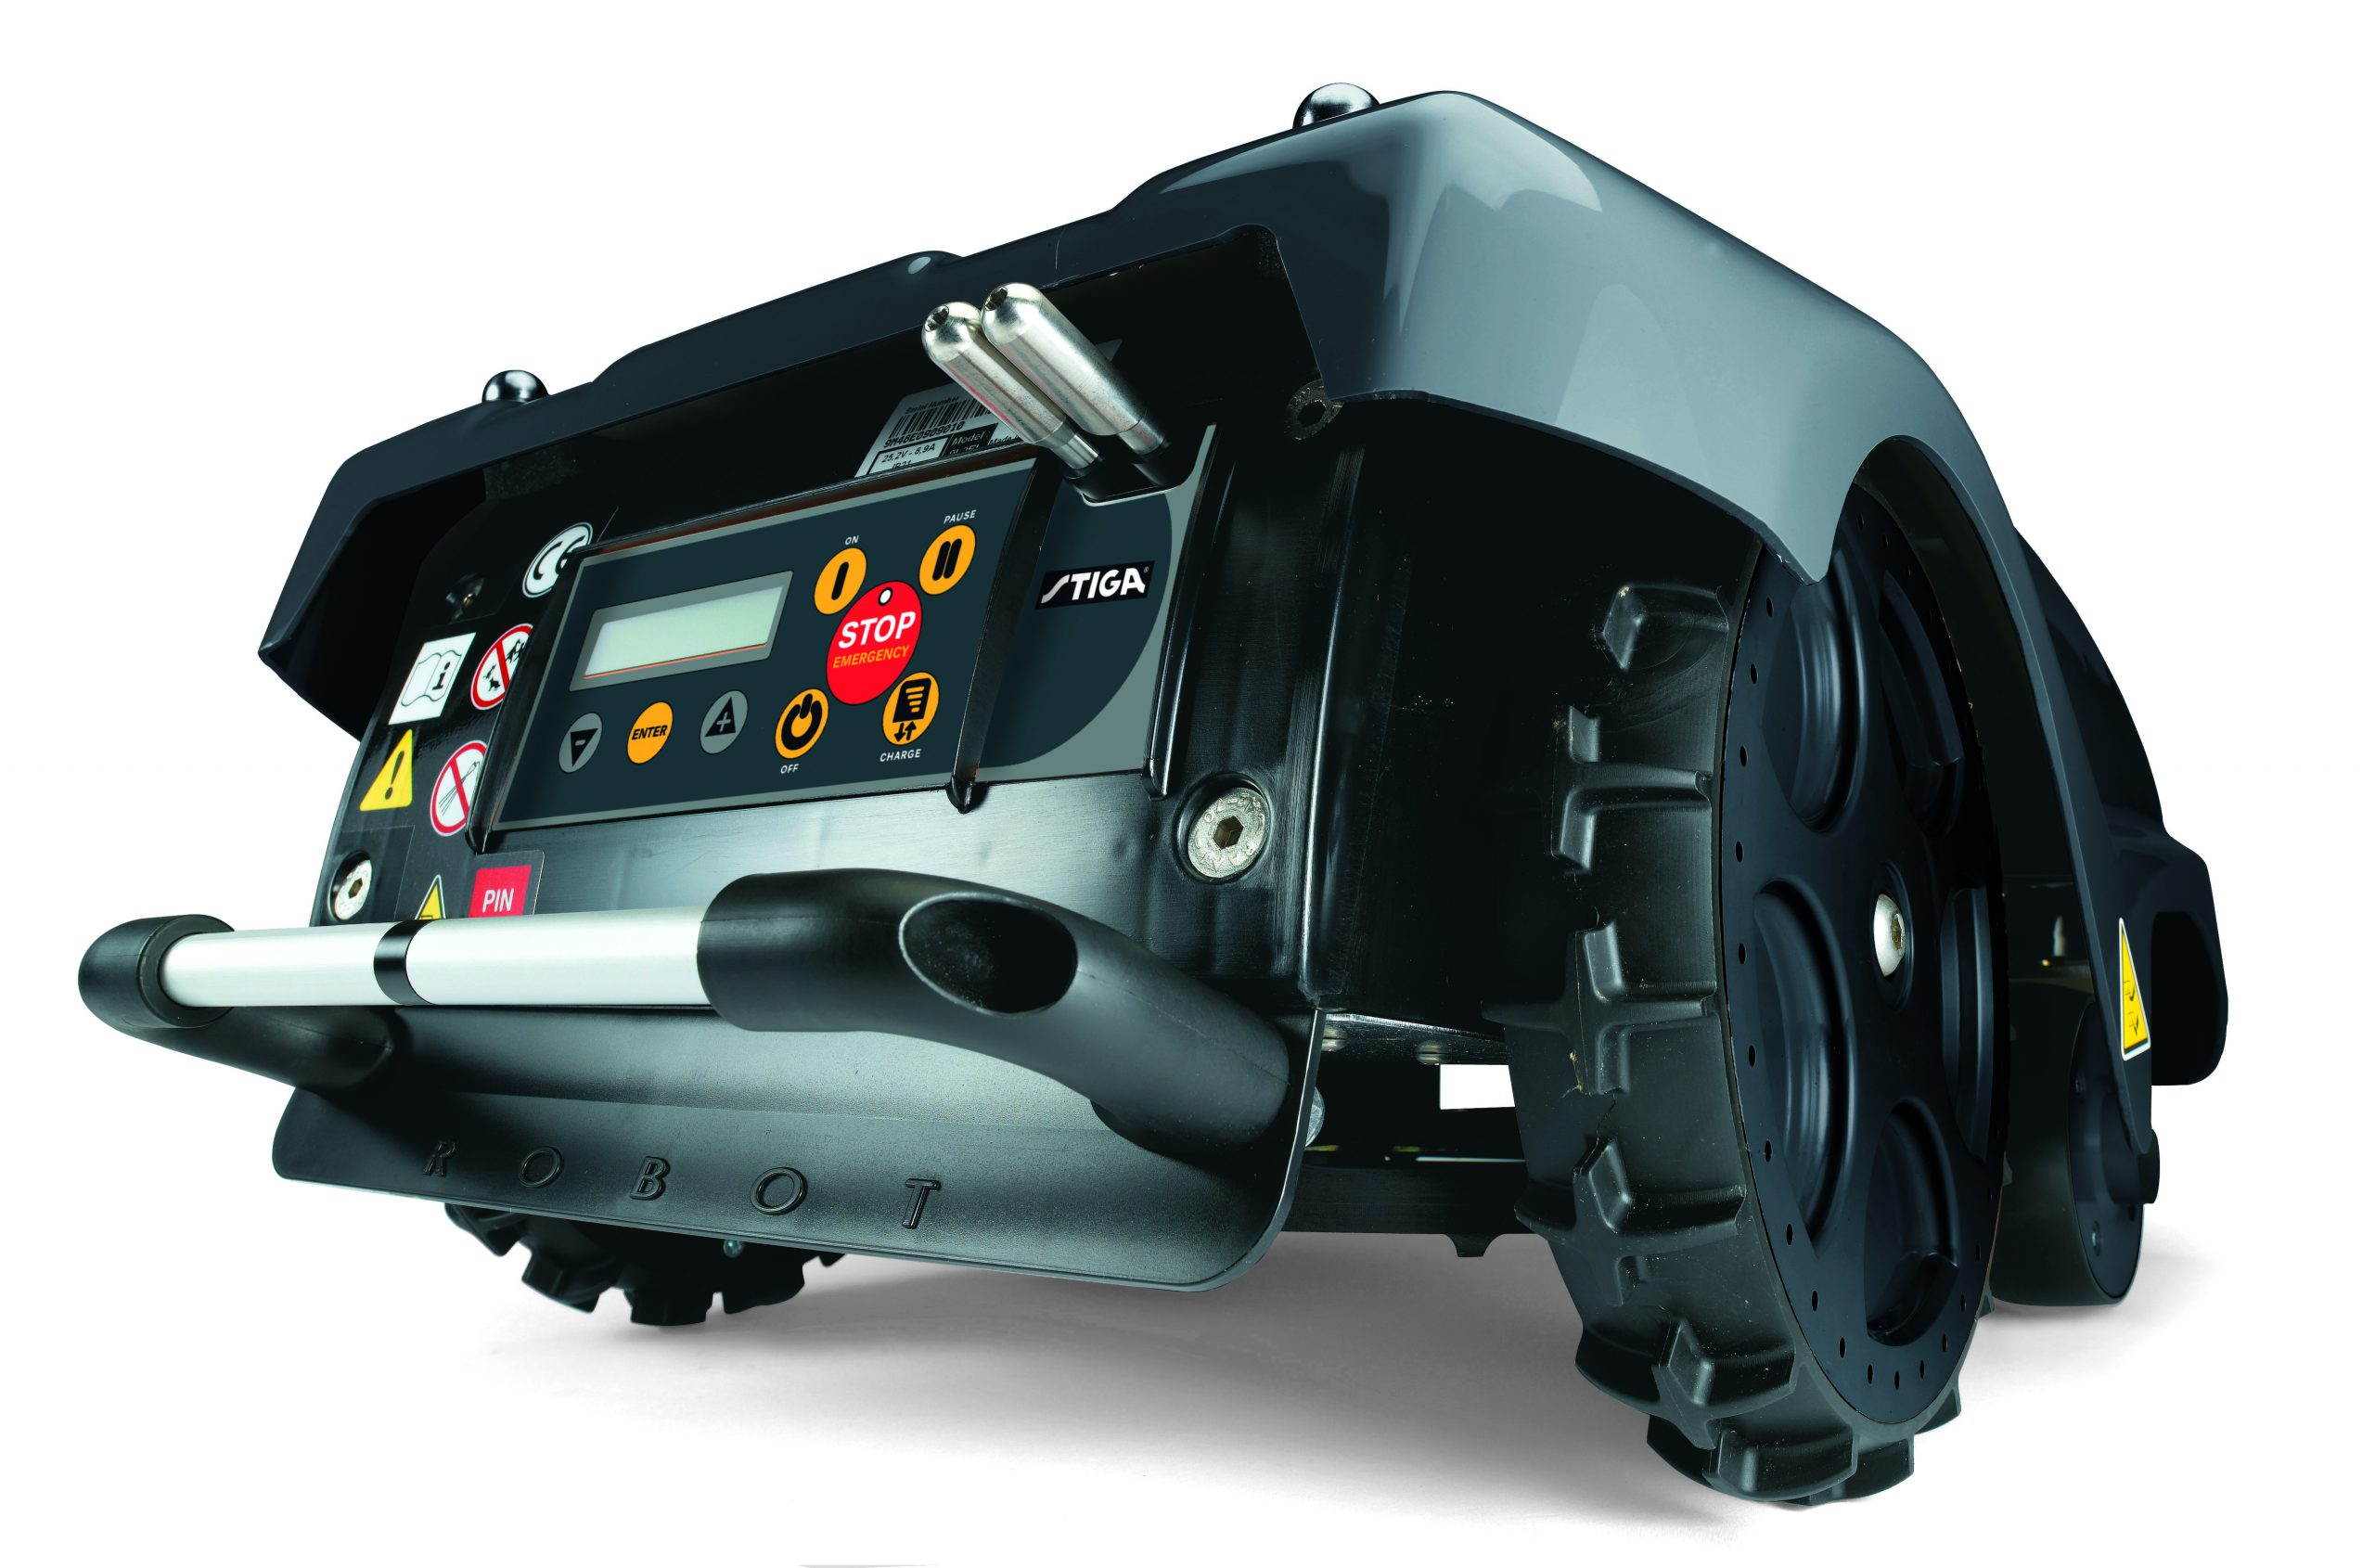 Робот-газонокосилка Stiga Autoclip 523-2